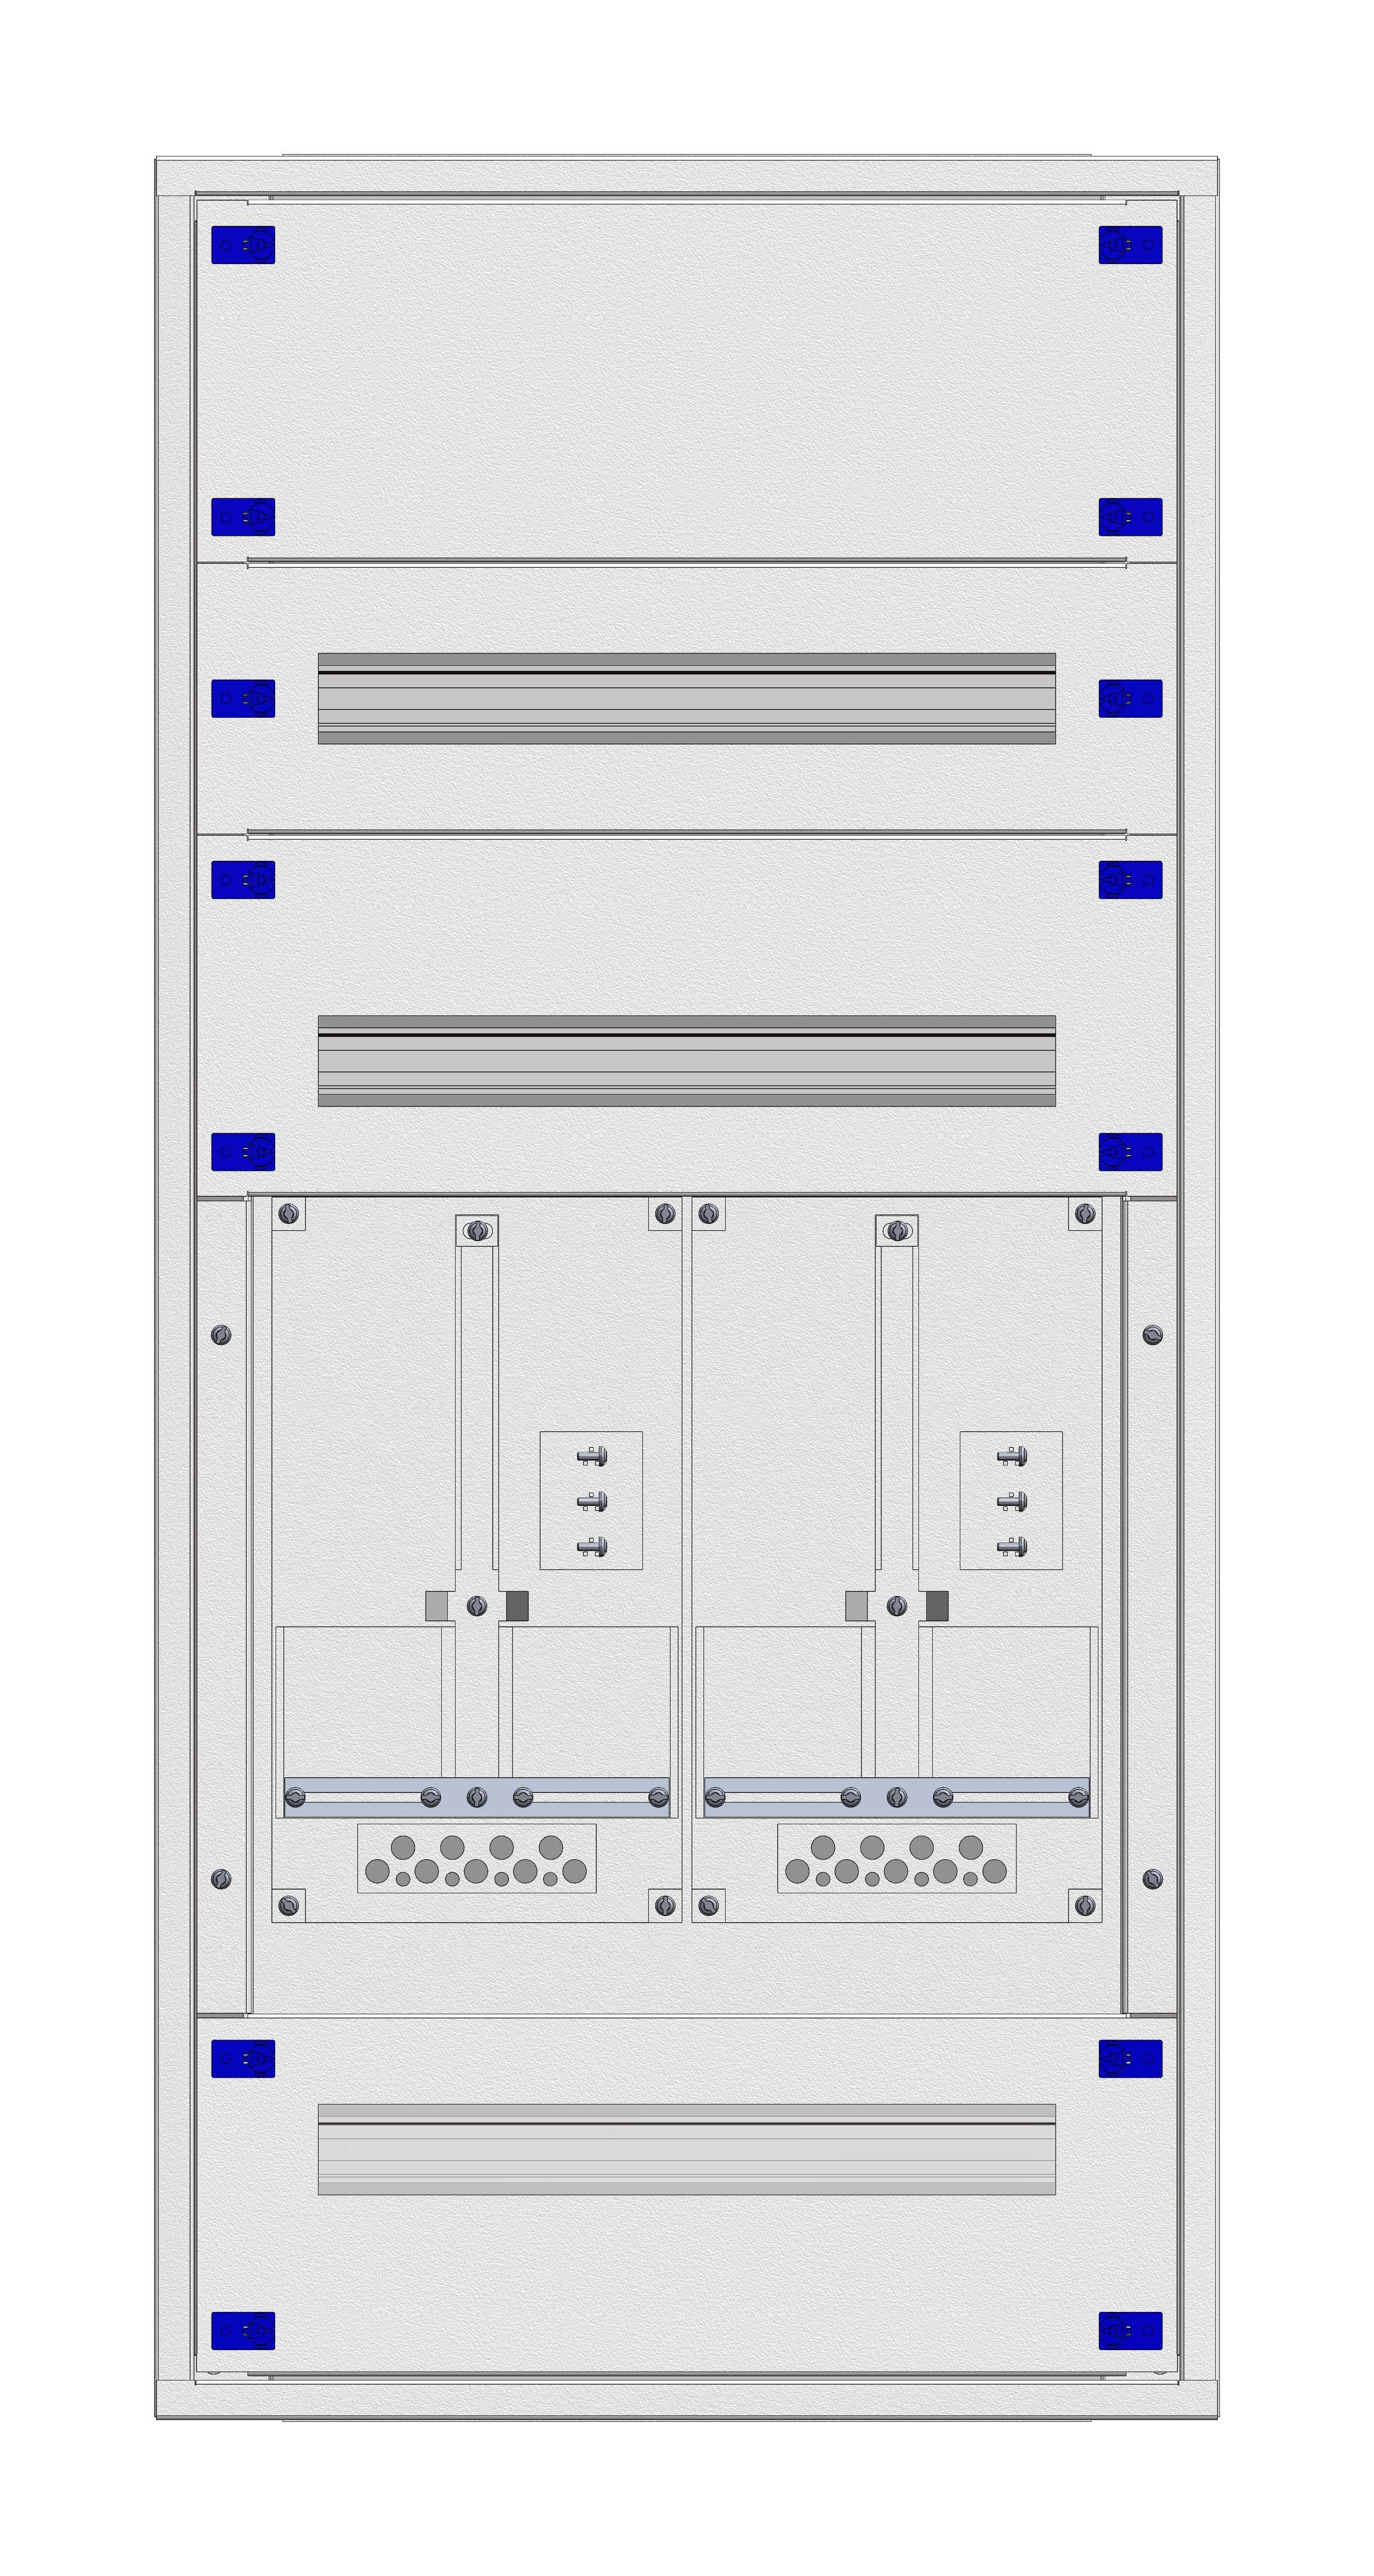 1 Stk Aufputz-Zählerverteiler 2A-24E/VBG 2ZP, H1195B590T250mm IL160224VS